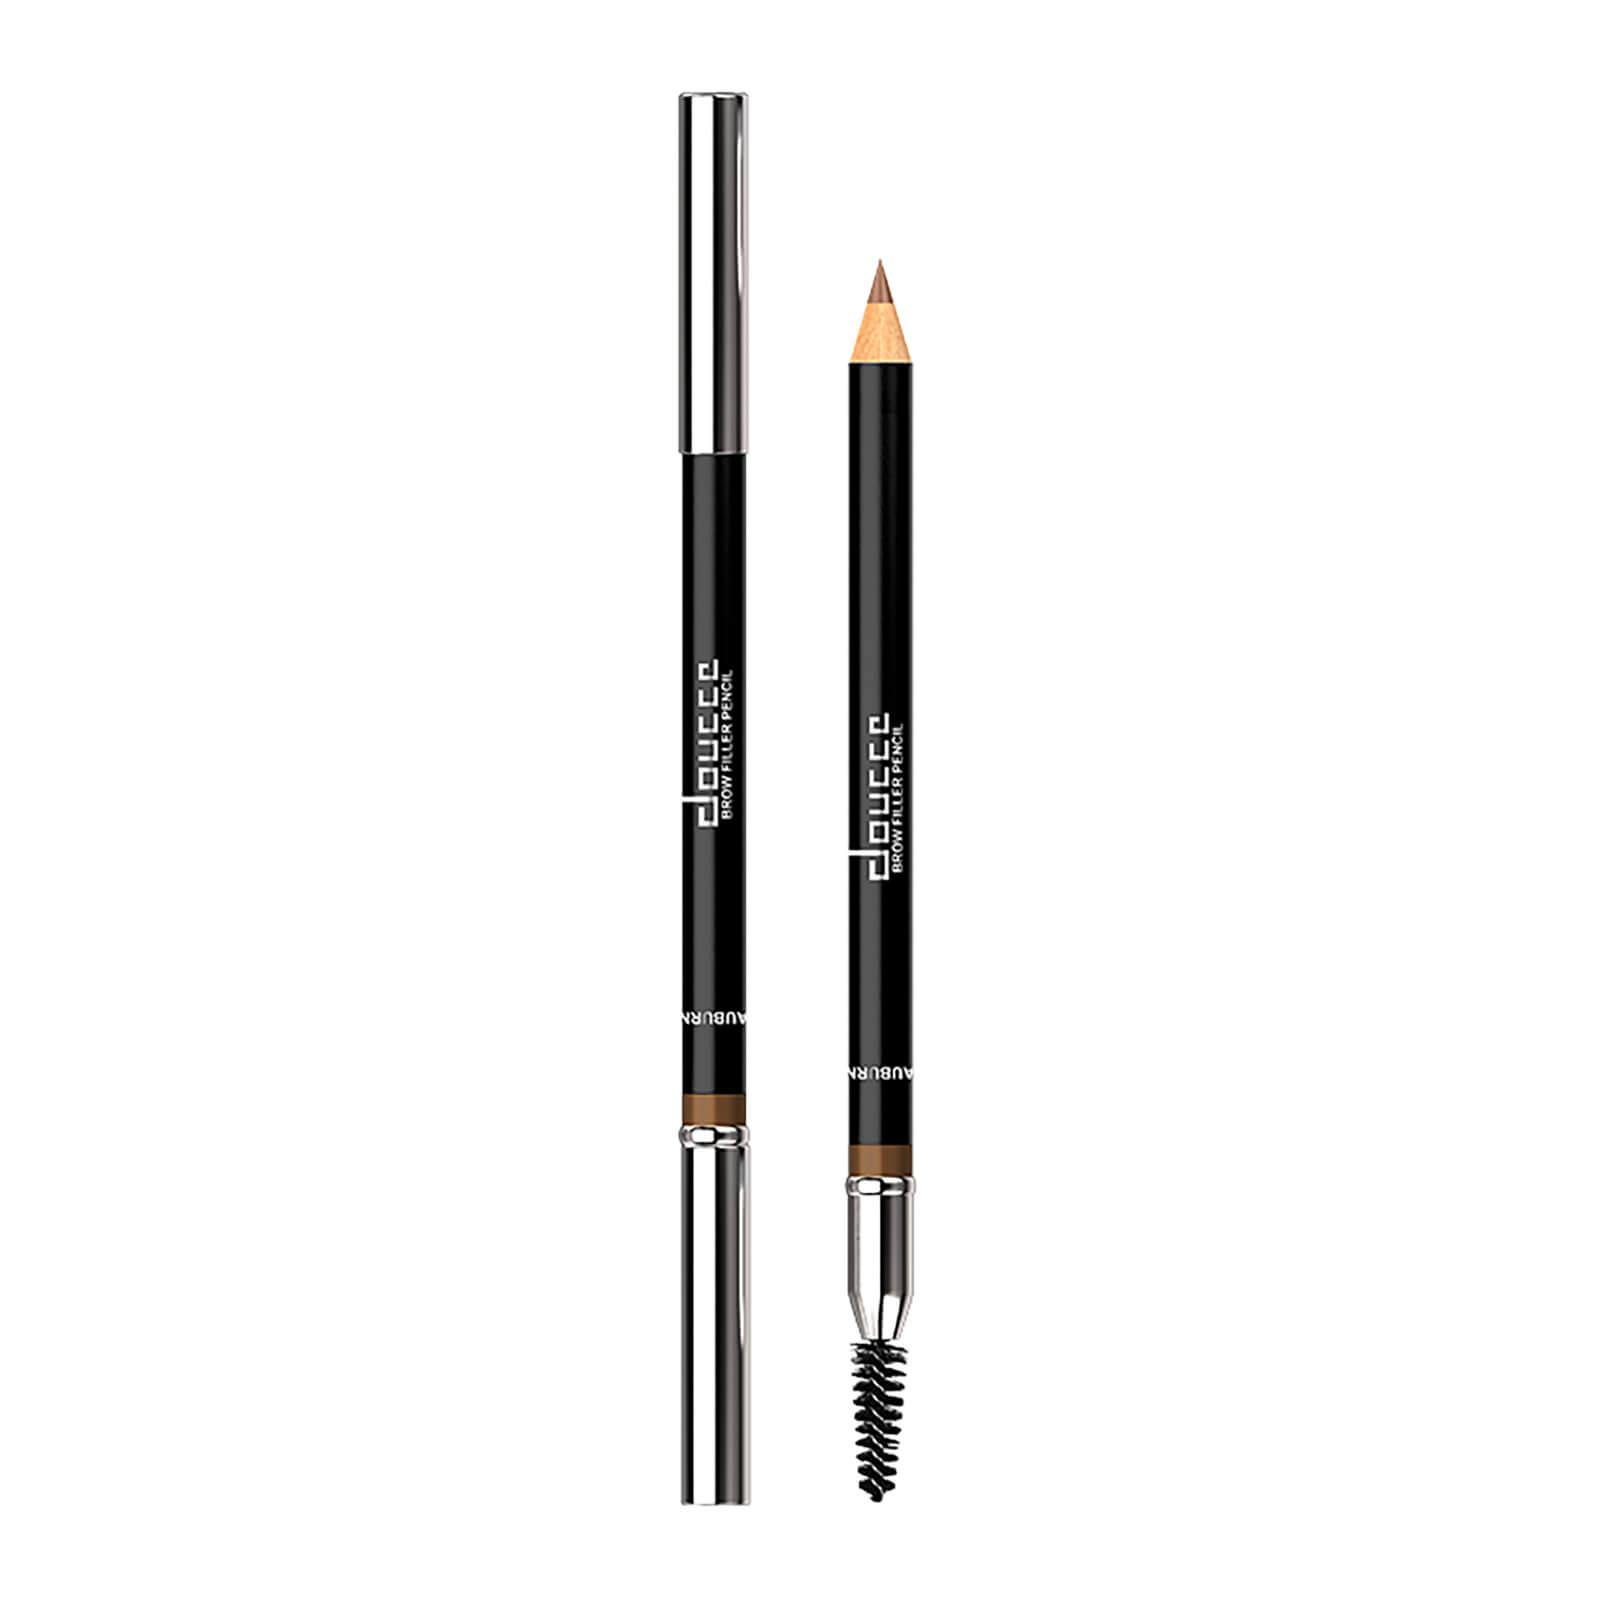 doucce Brow Filler matita per sopracciglia - 1,25 g (varie tonalità) - Auburn (621)